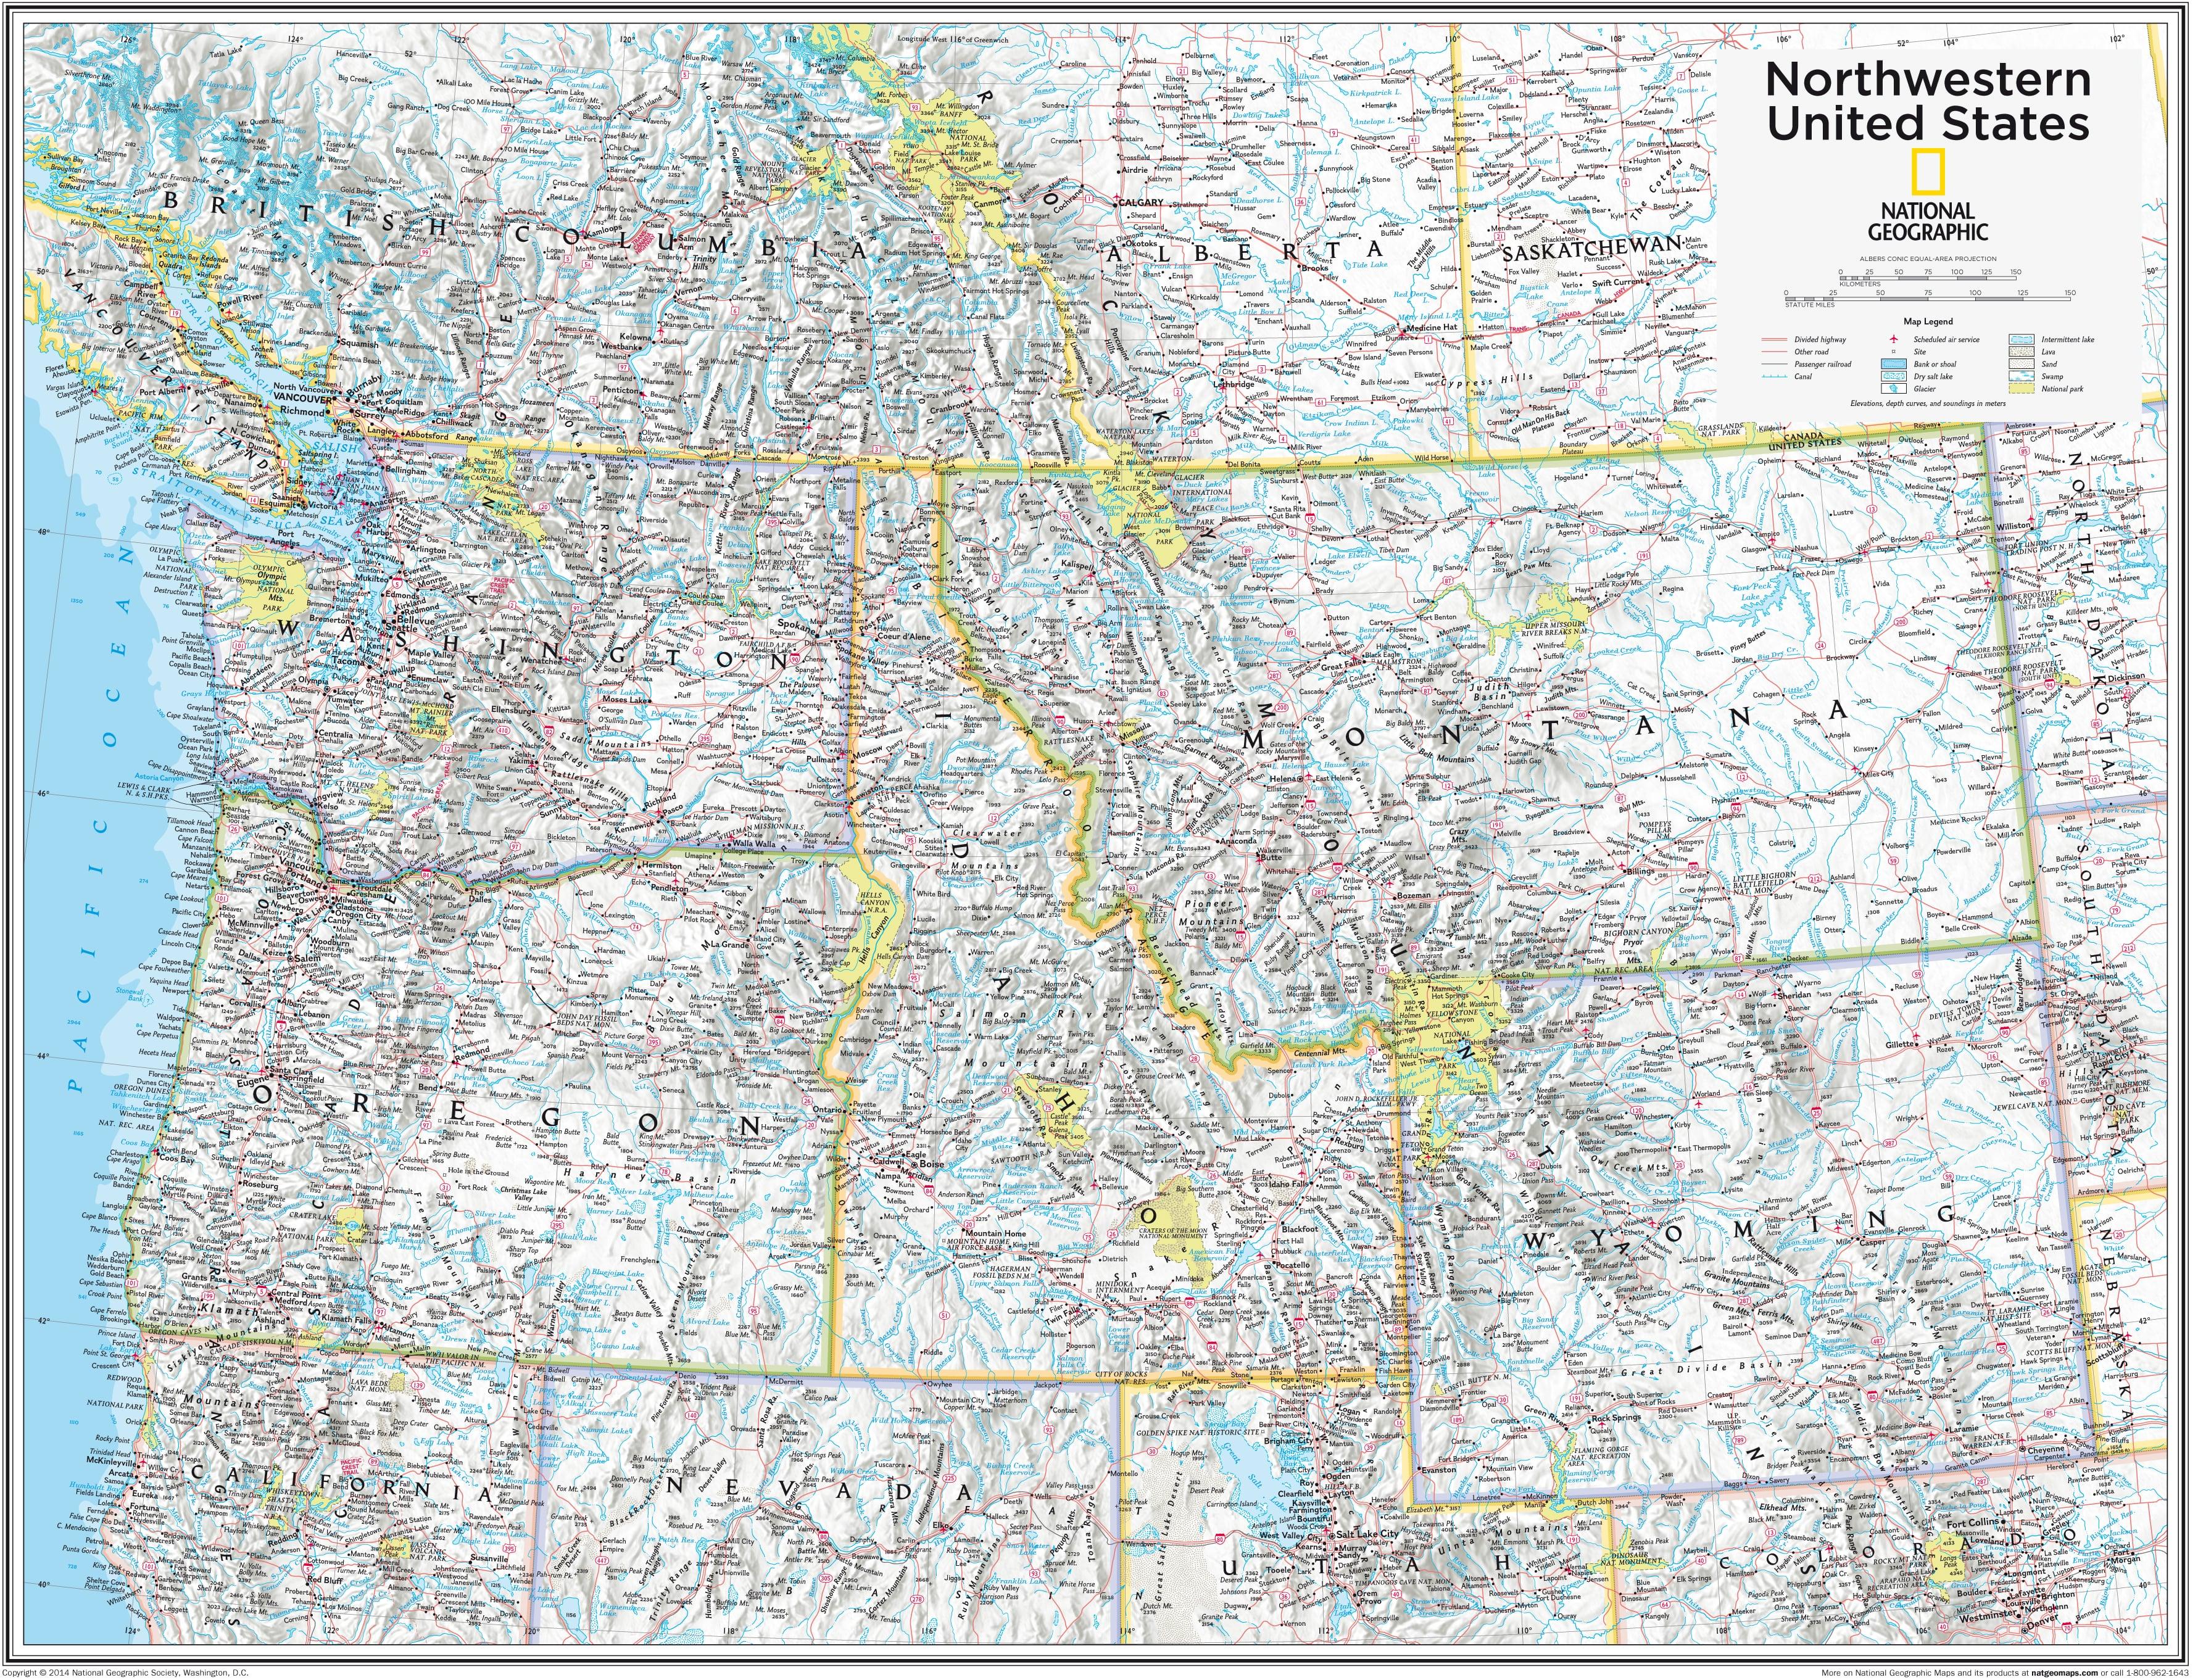 Northwestern United States 91 x 73cm